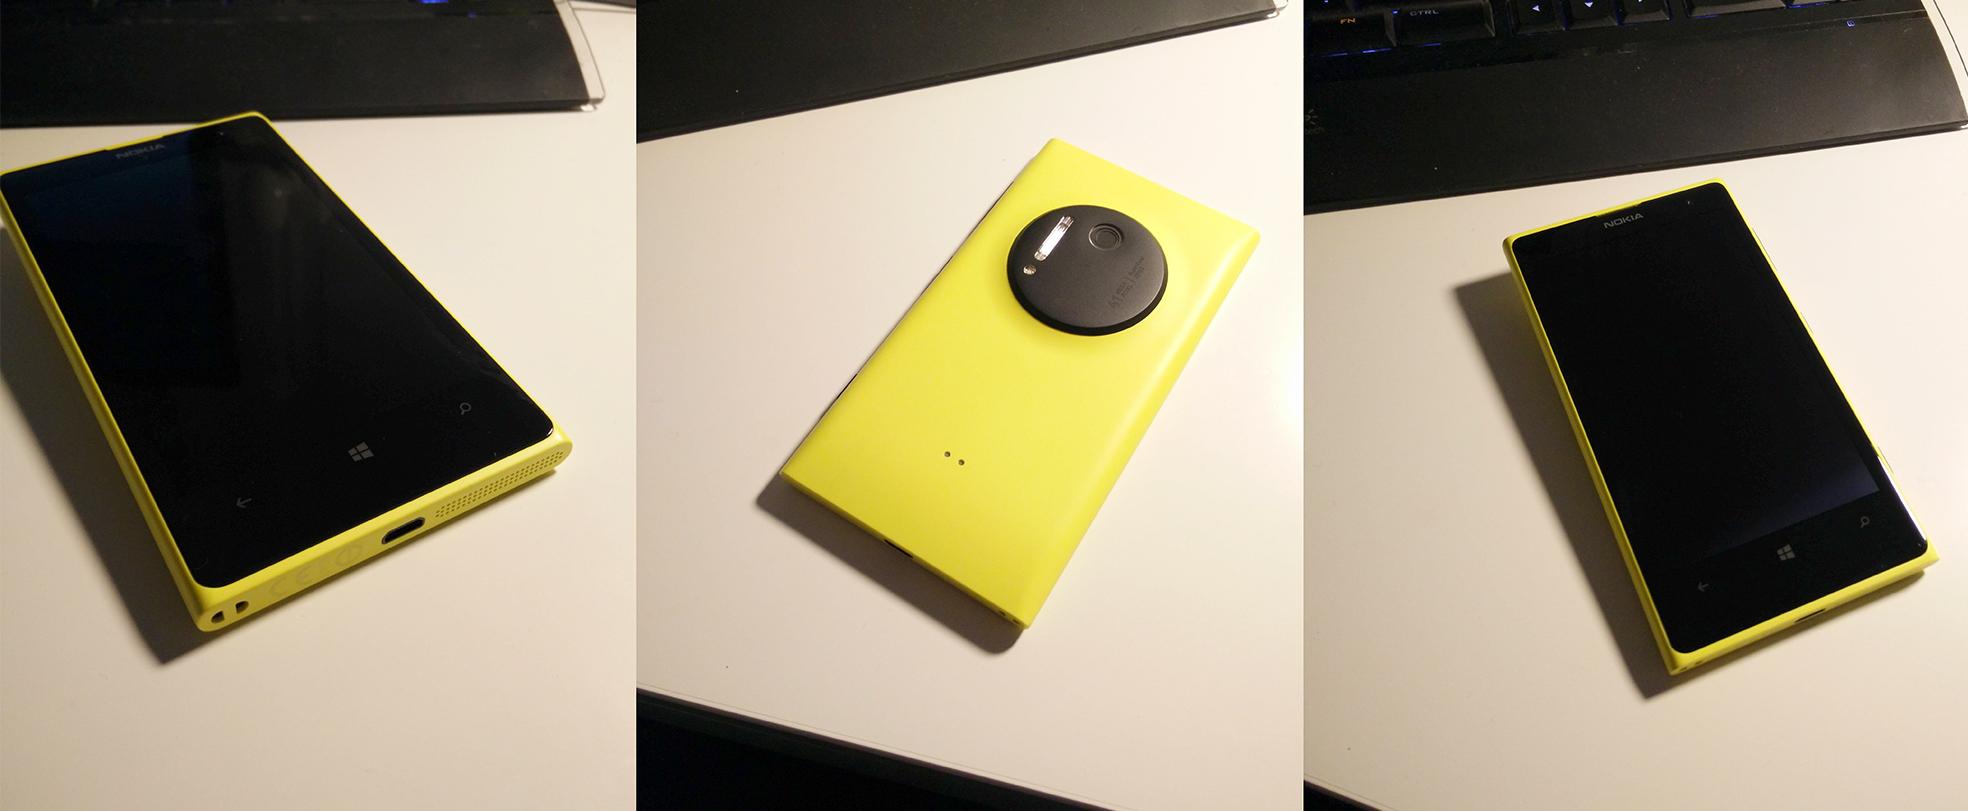 http://limandao.free.fr/hardware/lumia.jpg